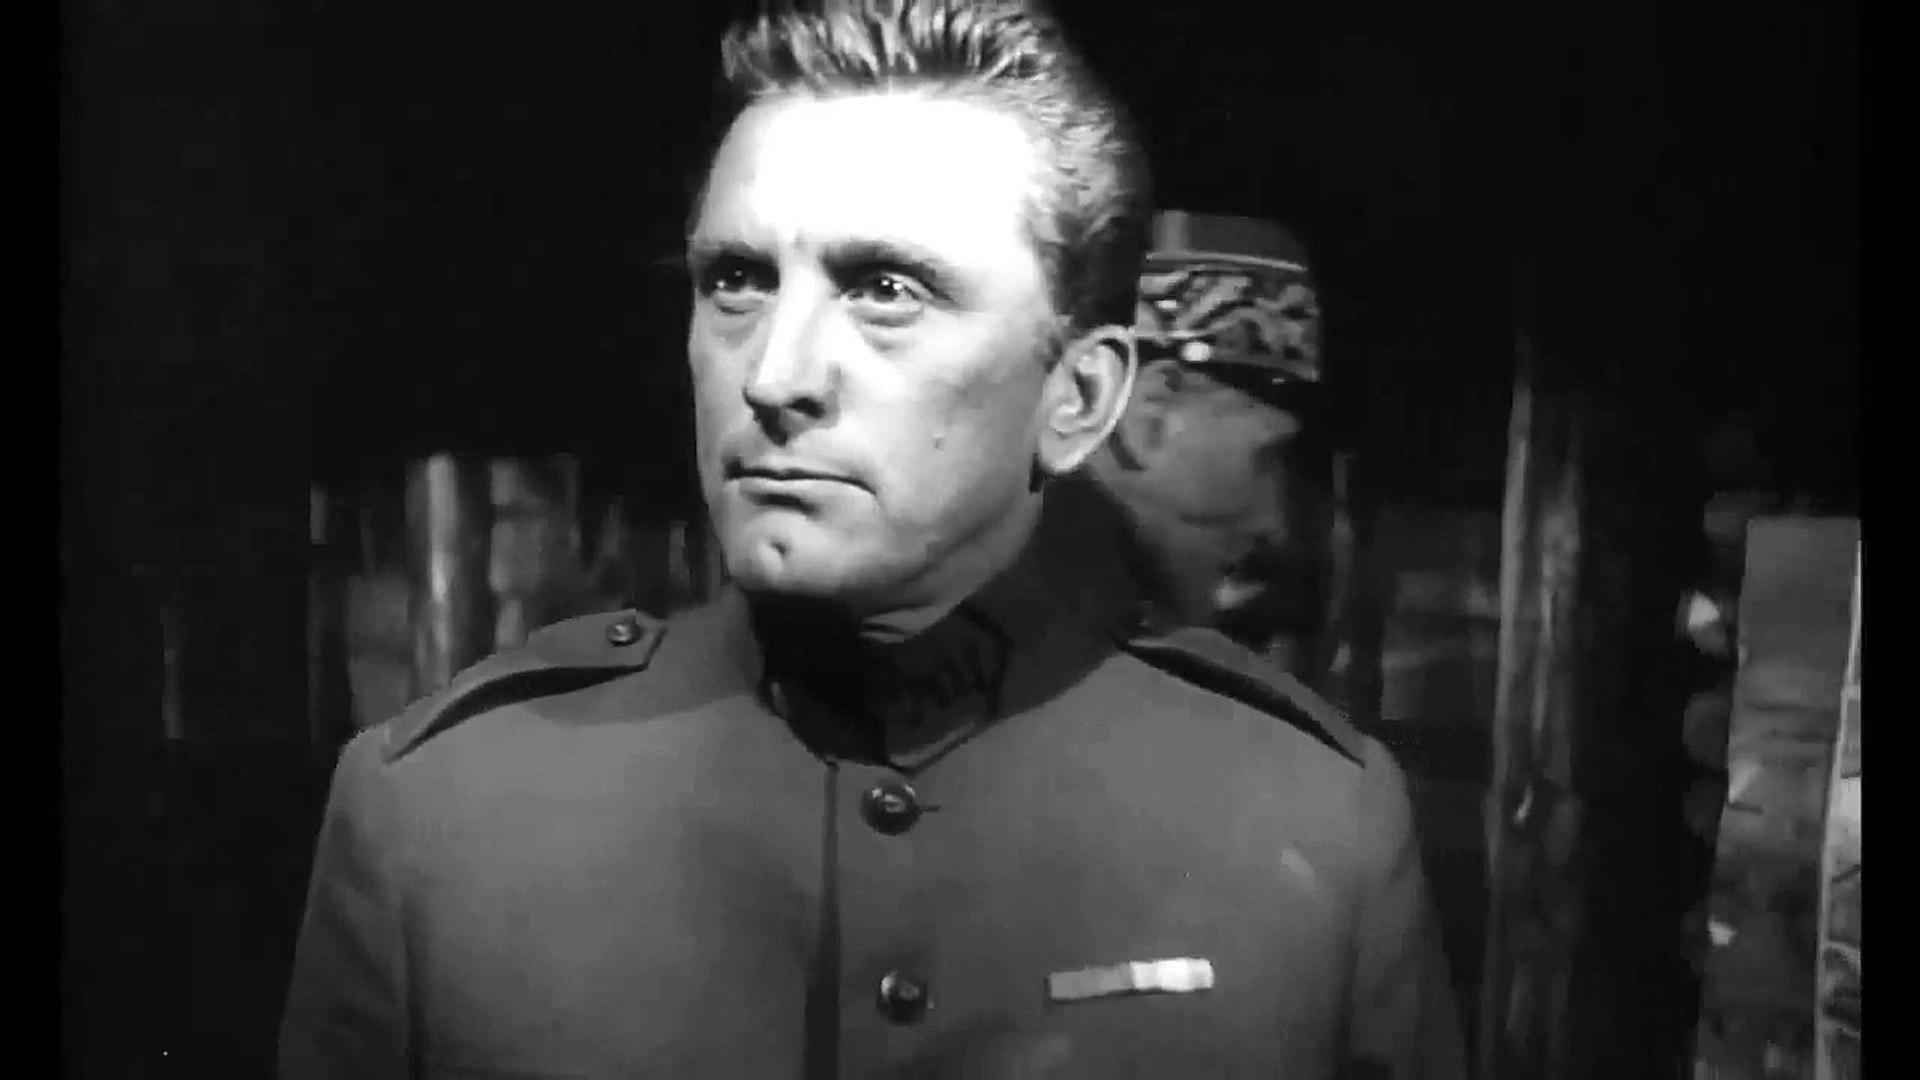 Paths of Glory (1957) Original Trailer - B&W / 2:53 mins